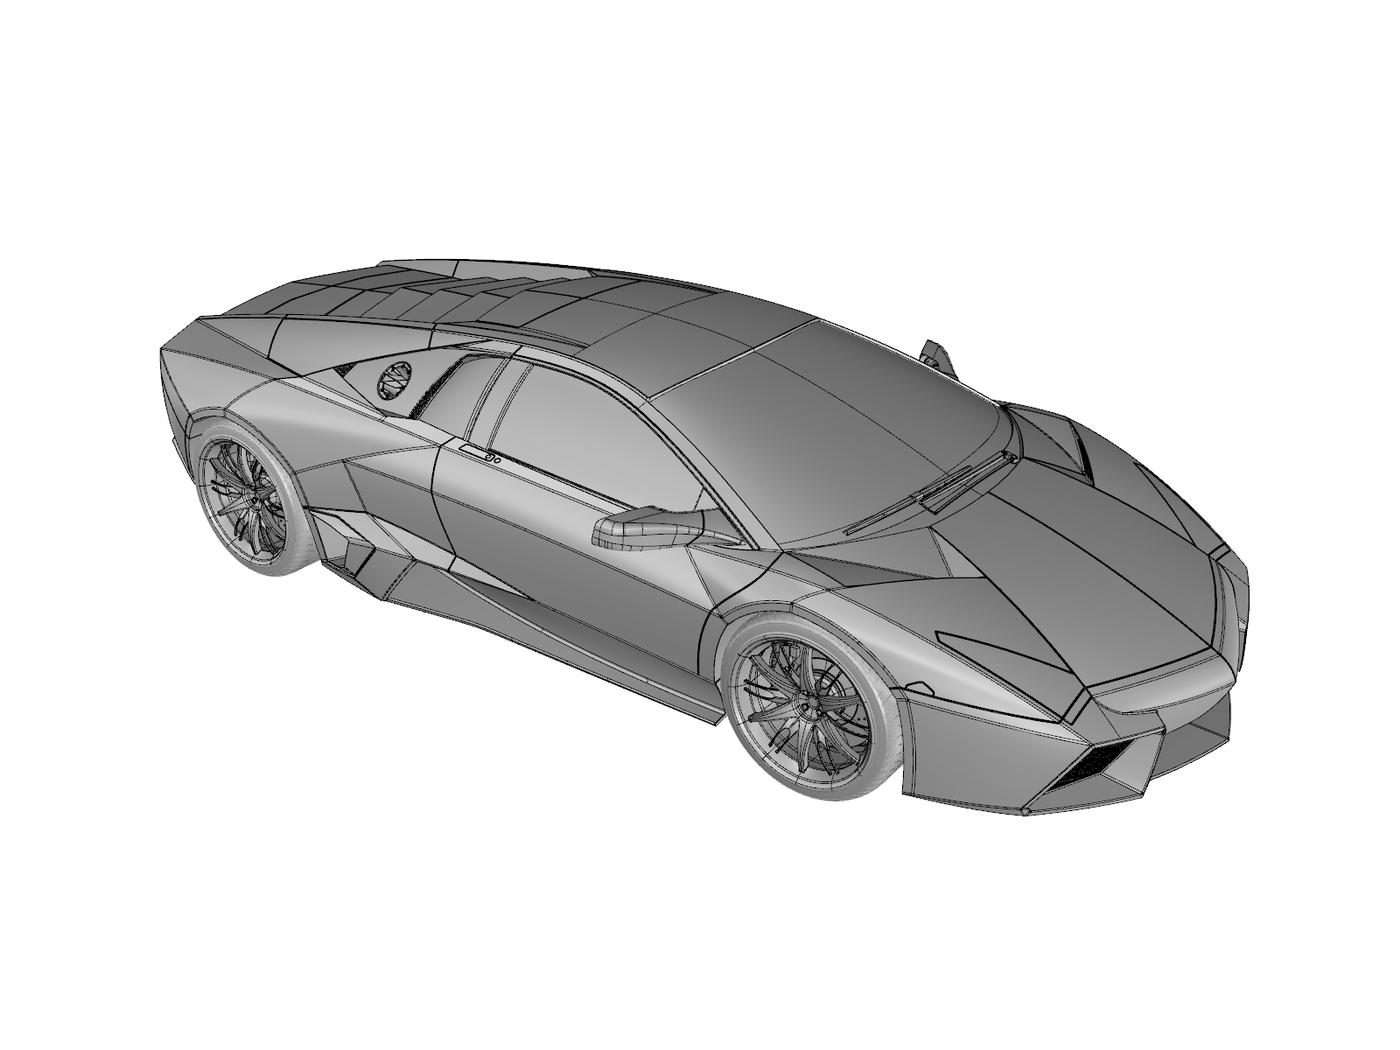 Lamborghini Reventon By Alexander Petrov At Coroflot Com